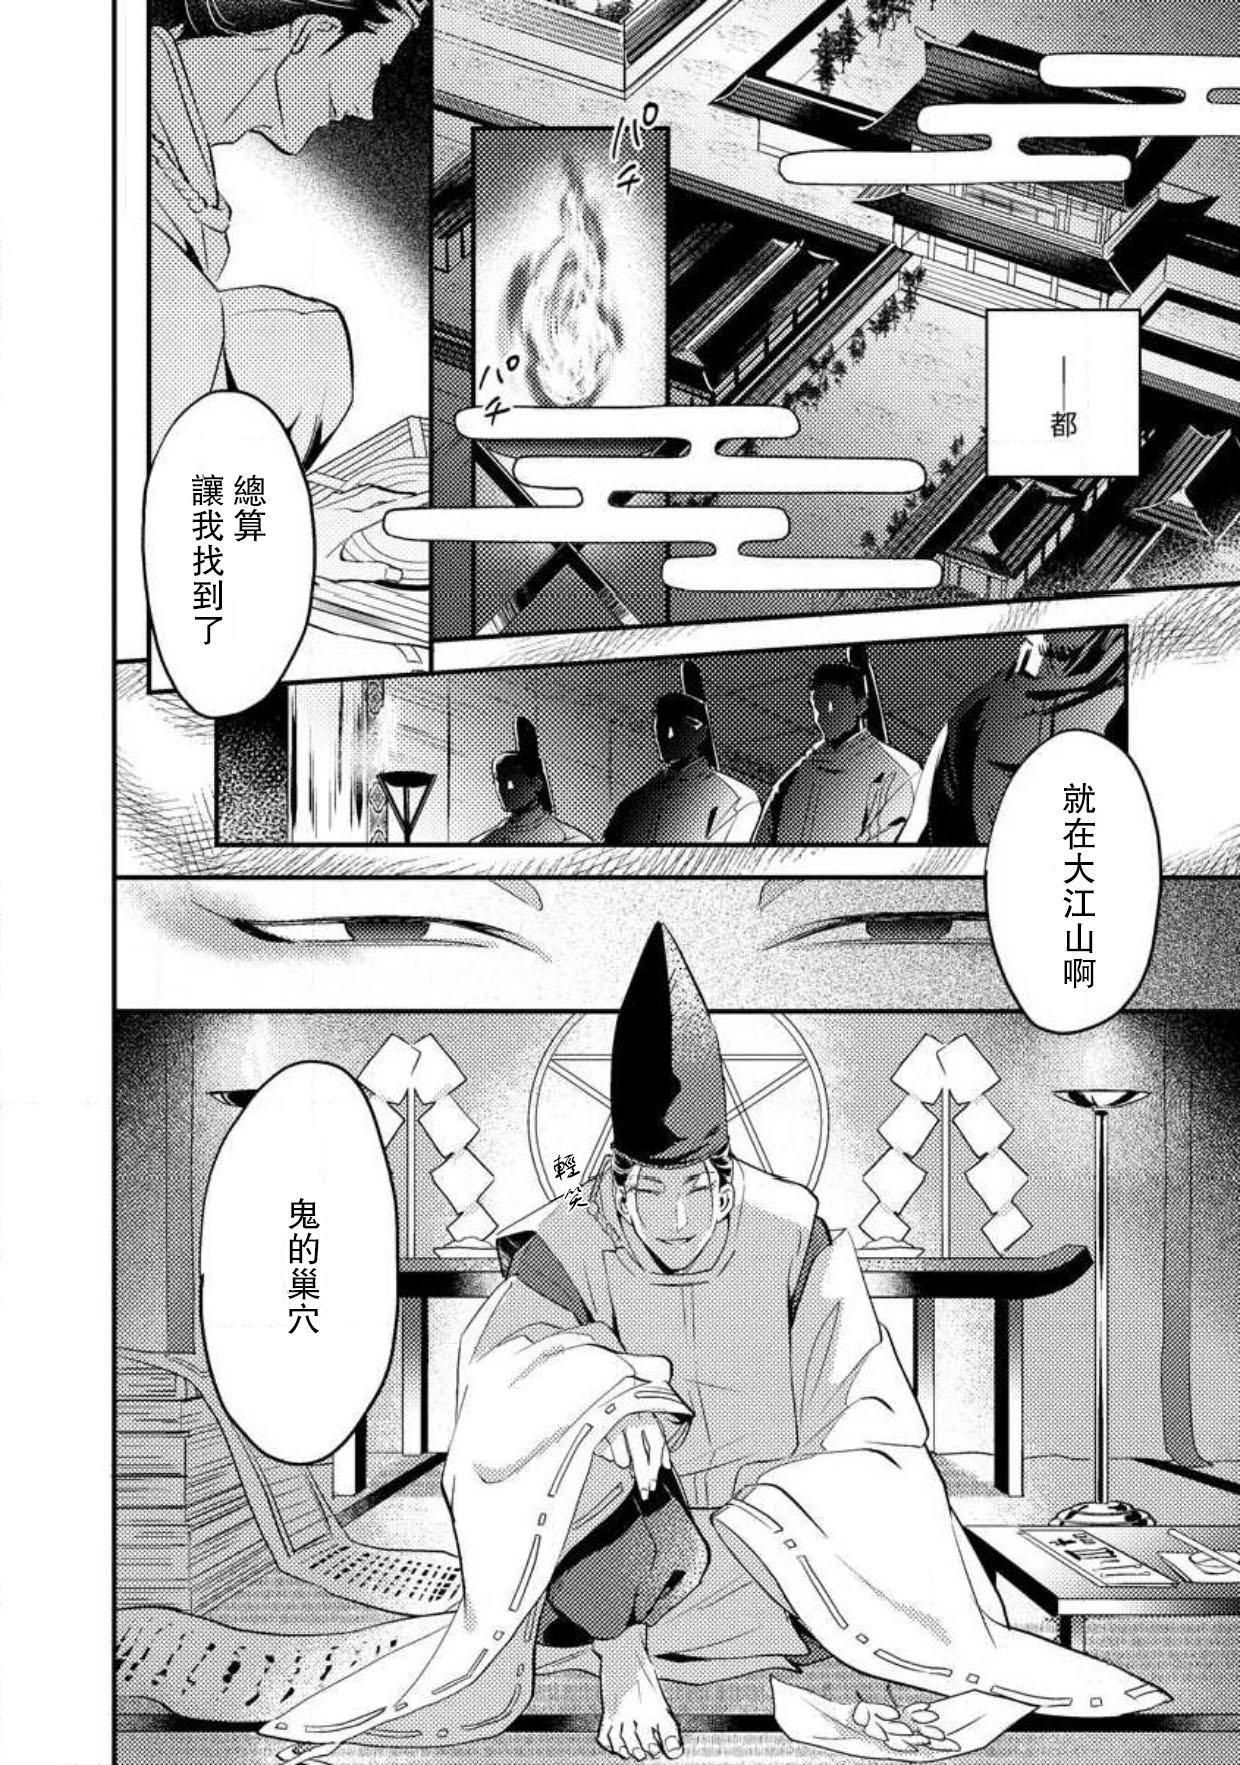 Oeyama suimutan utsukushiki oni no toraware hime | 大江山醉夢逸話 美麗的鬼與被囚禁的公主 Ch. 1-8 179